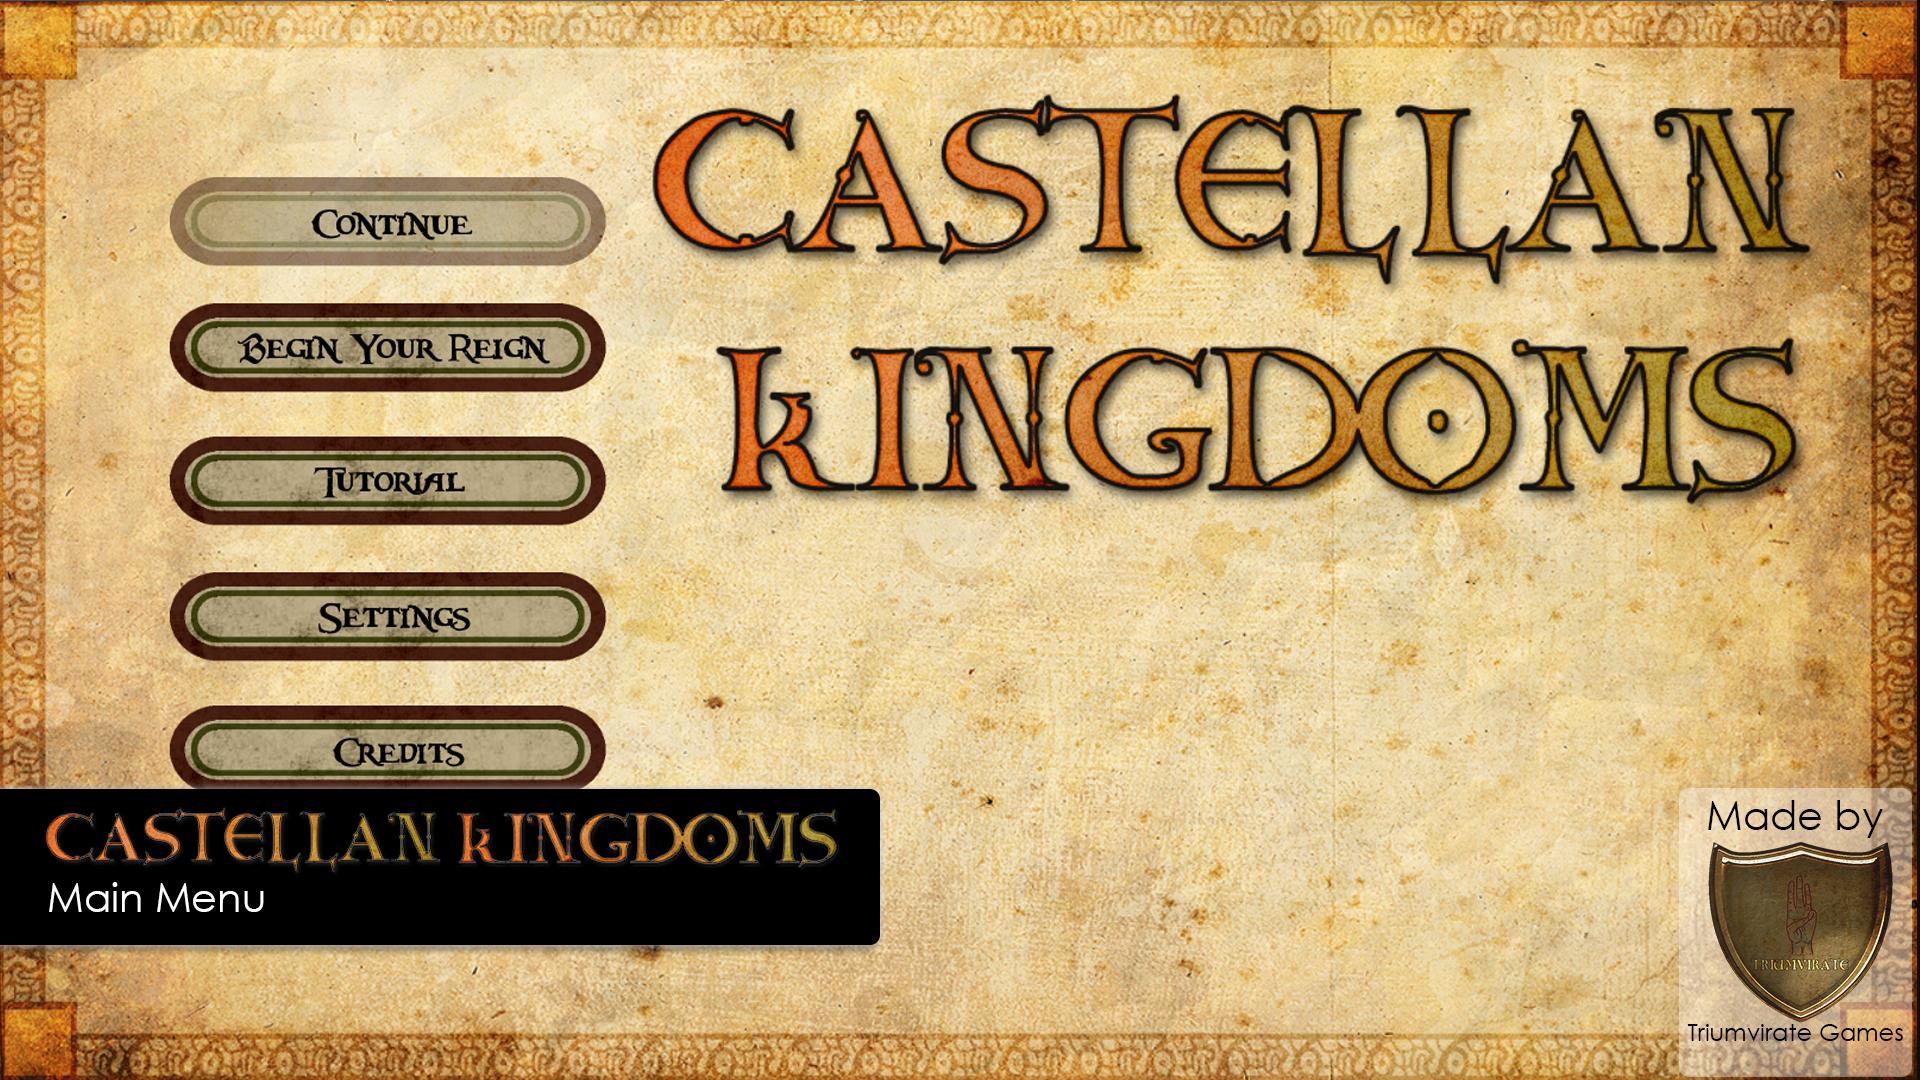 Castellan Kingdoms main menu